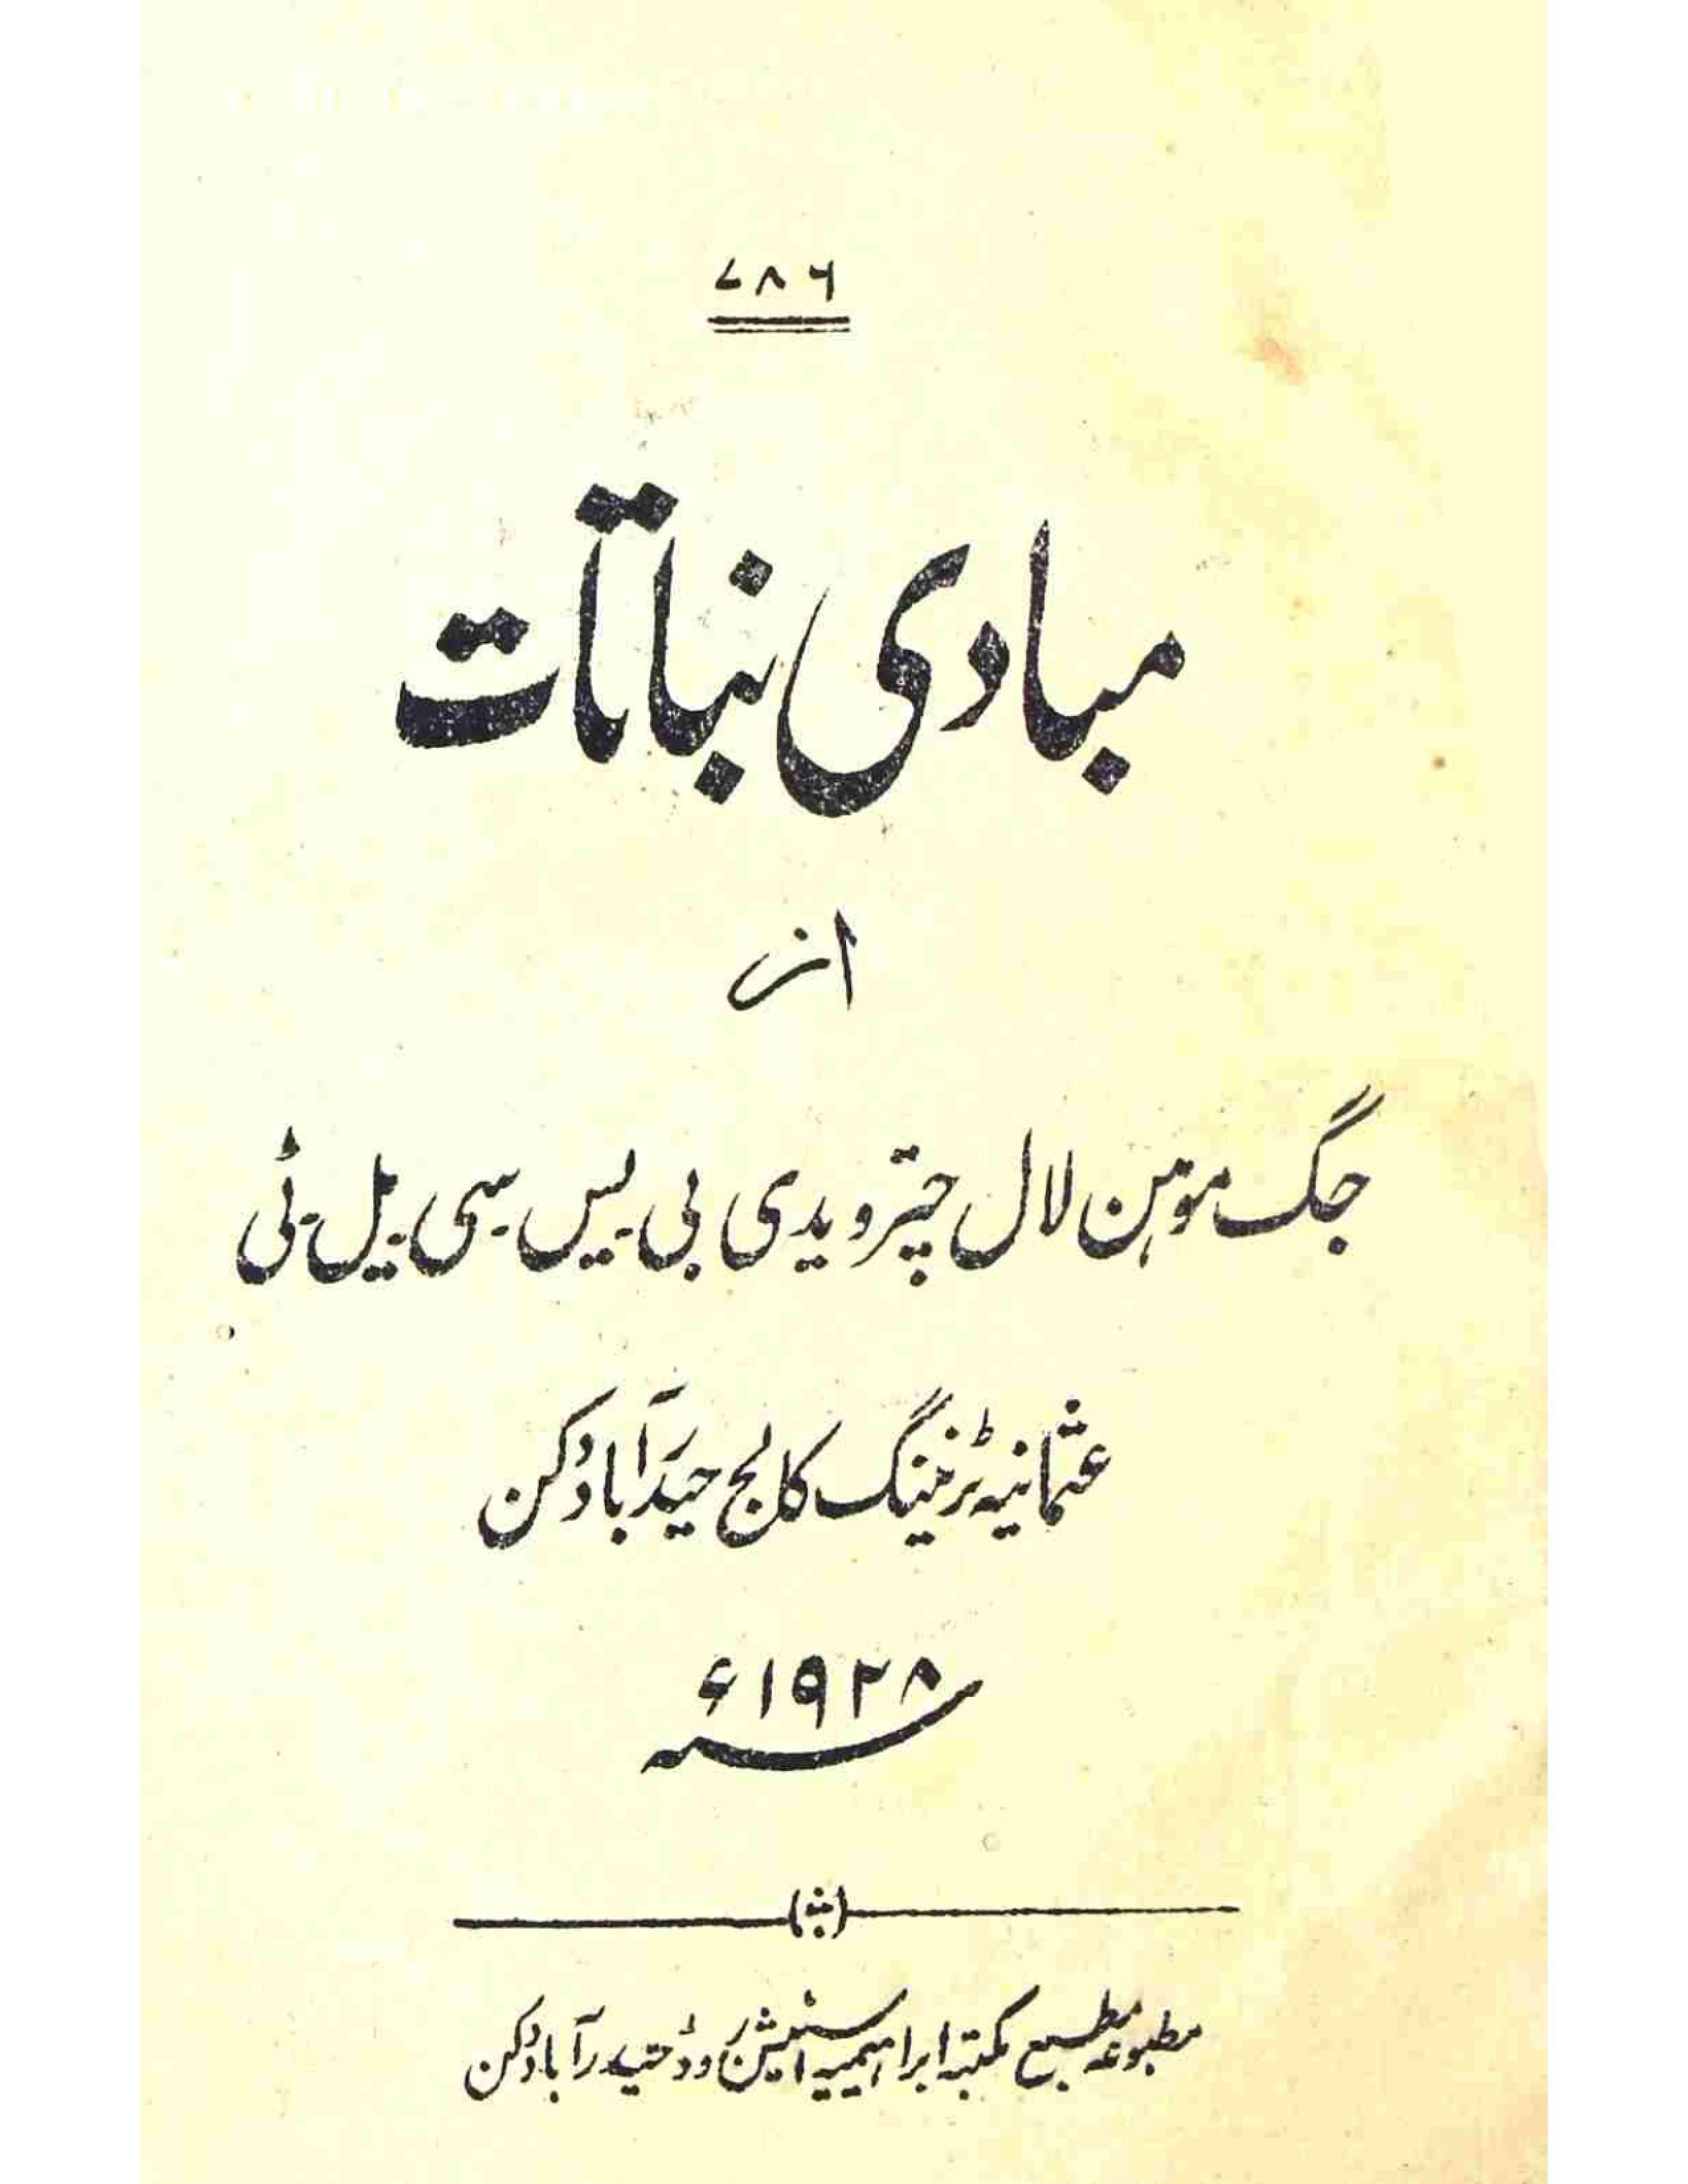 Mabadi-e-Nabatat